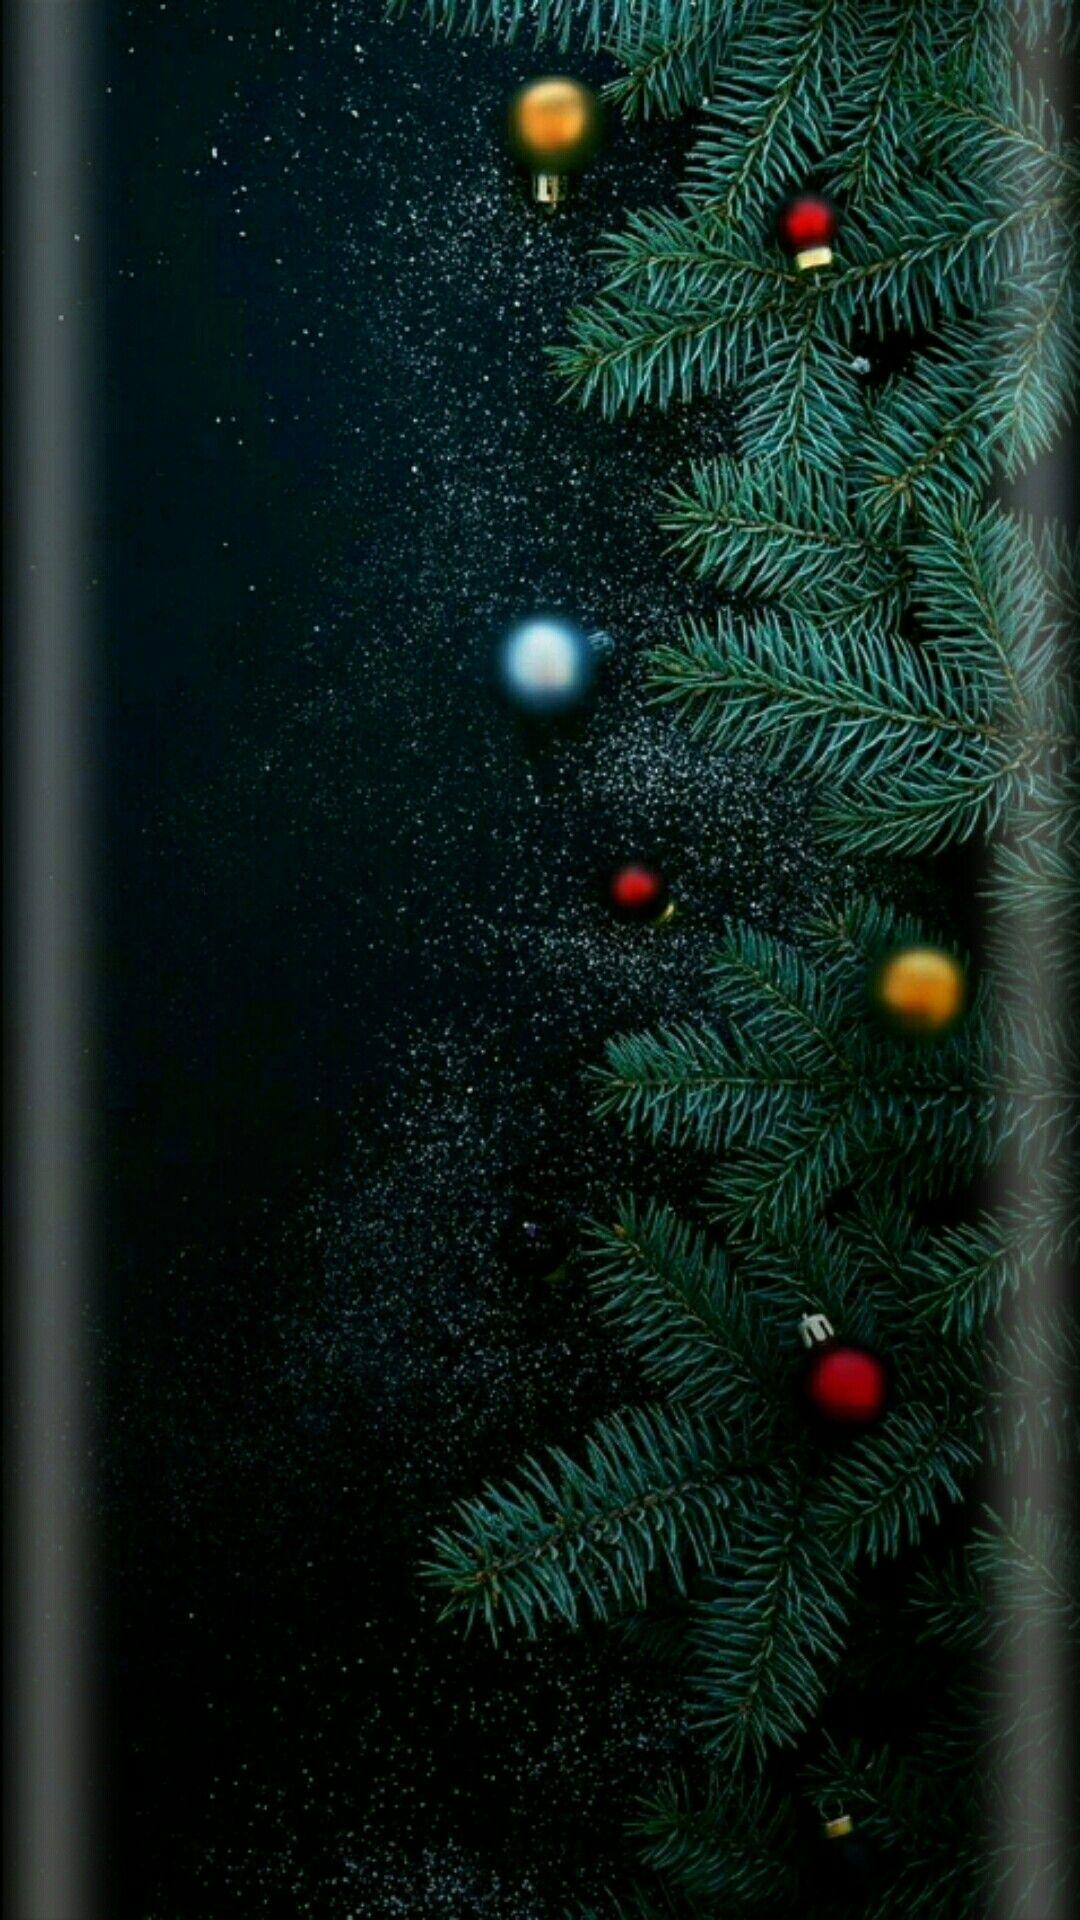 Iphone Wallpaper More Christmas Wallpaper